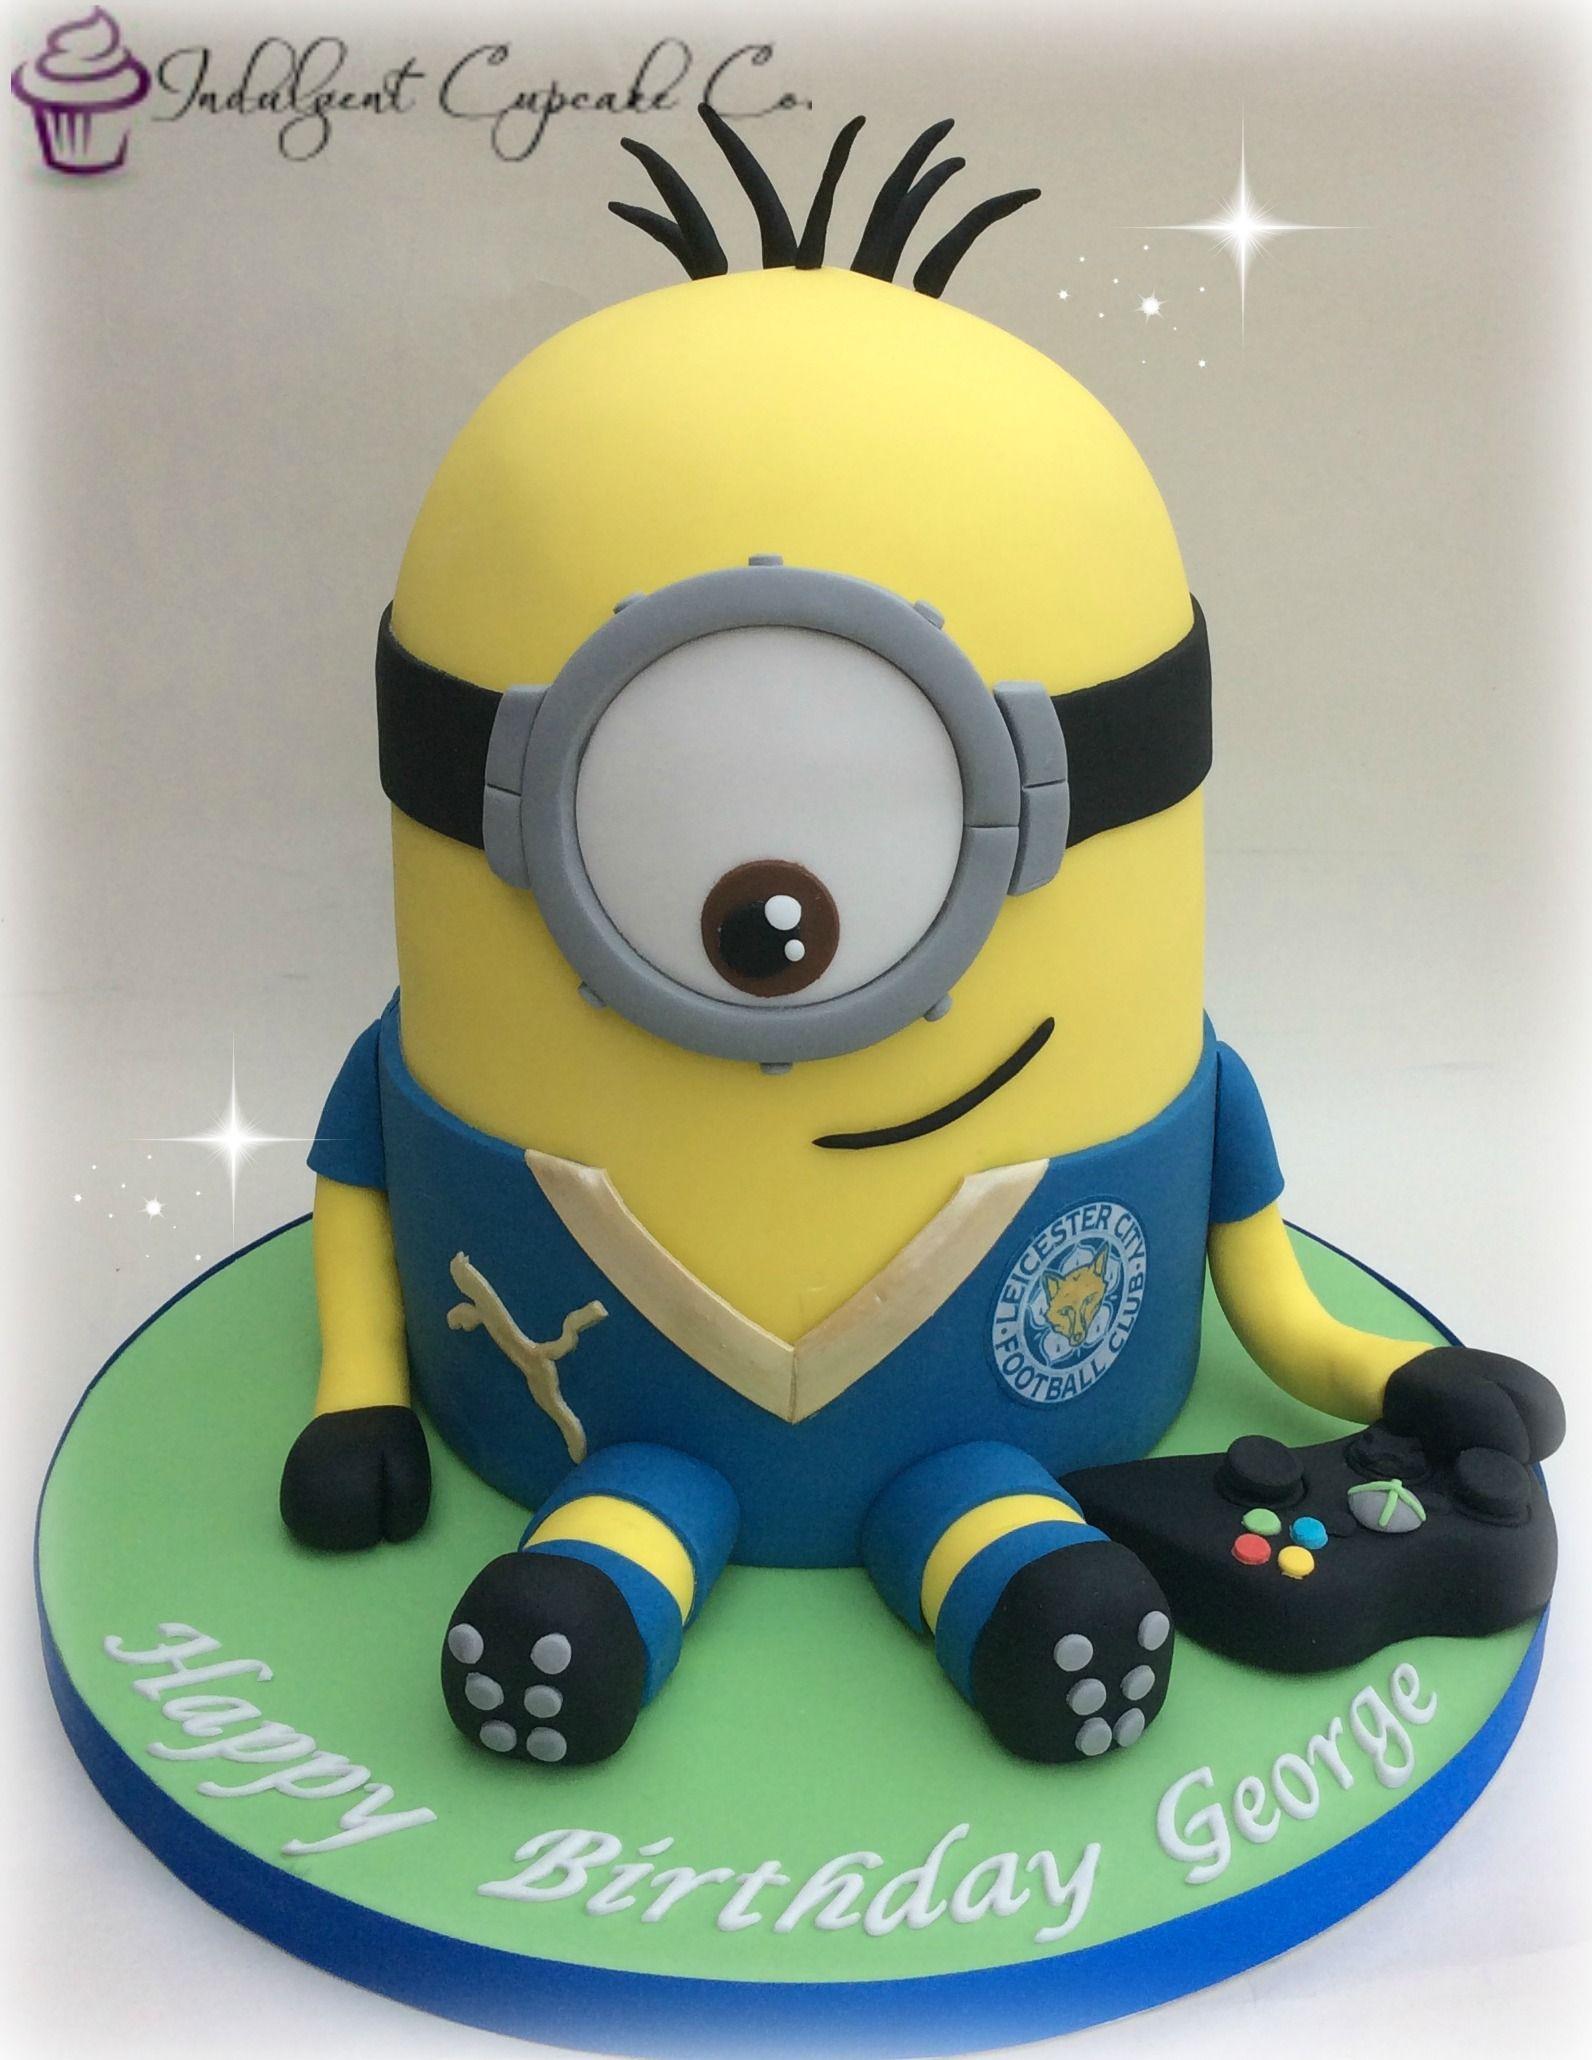 Leicester City Football Club LCFC Minion Football party